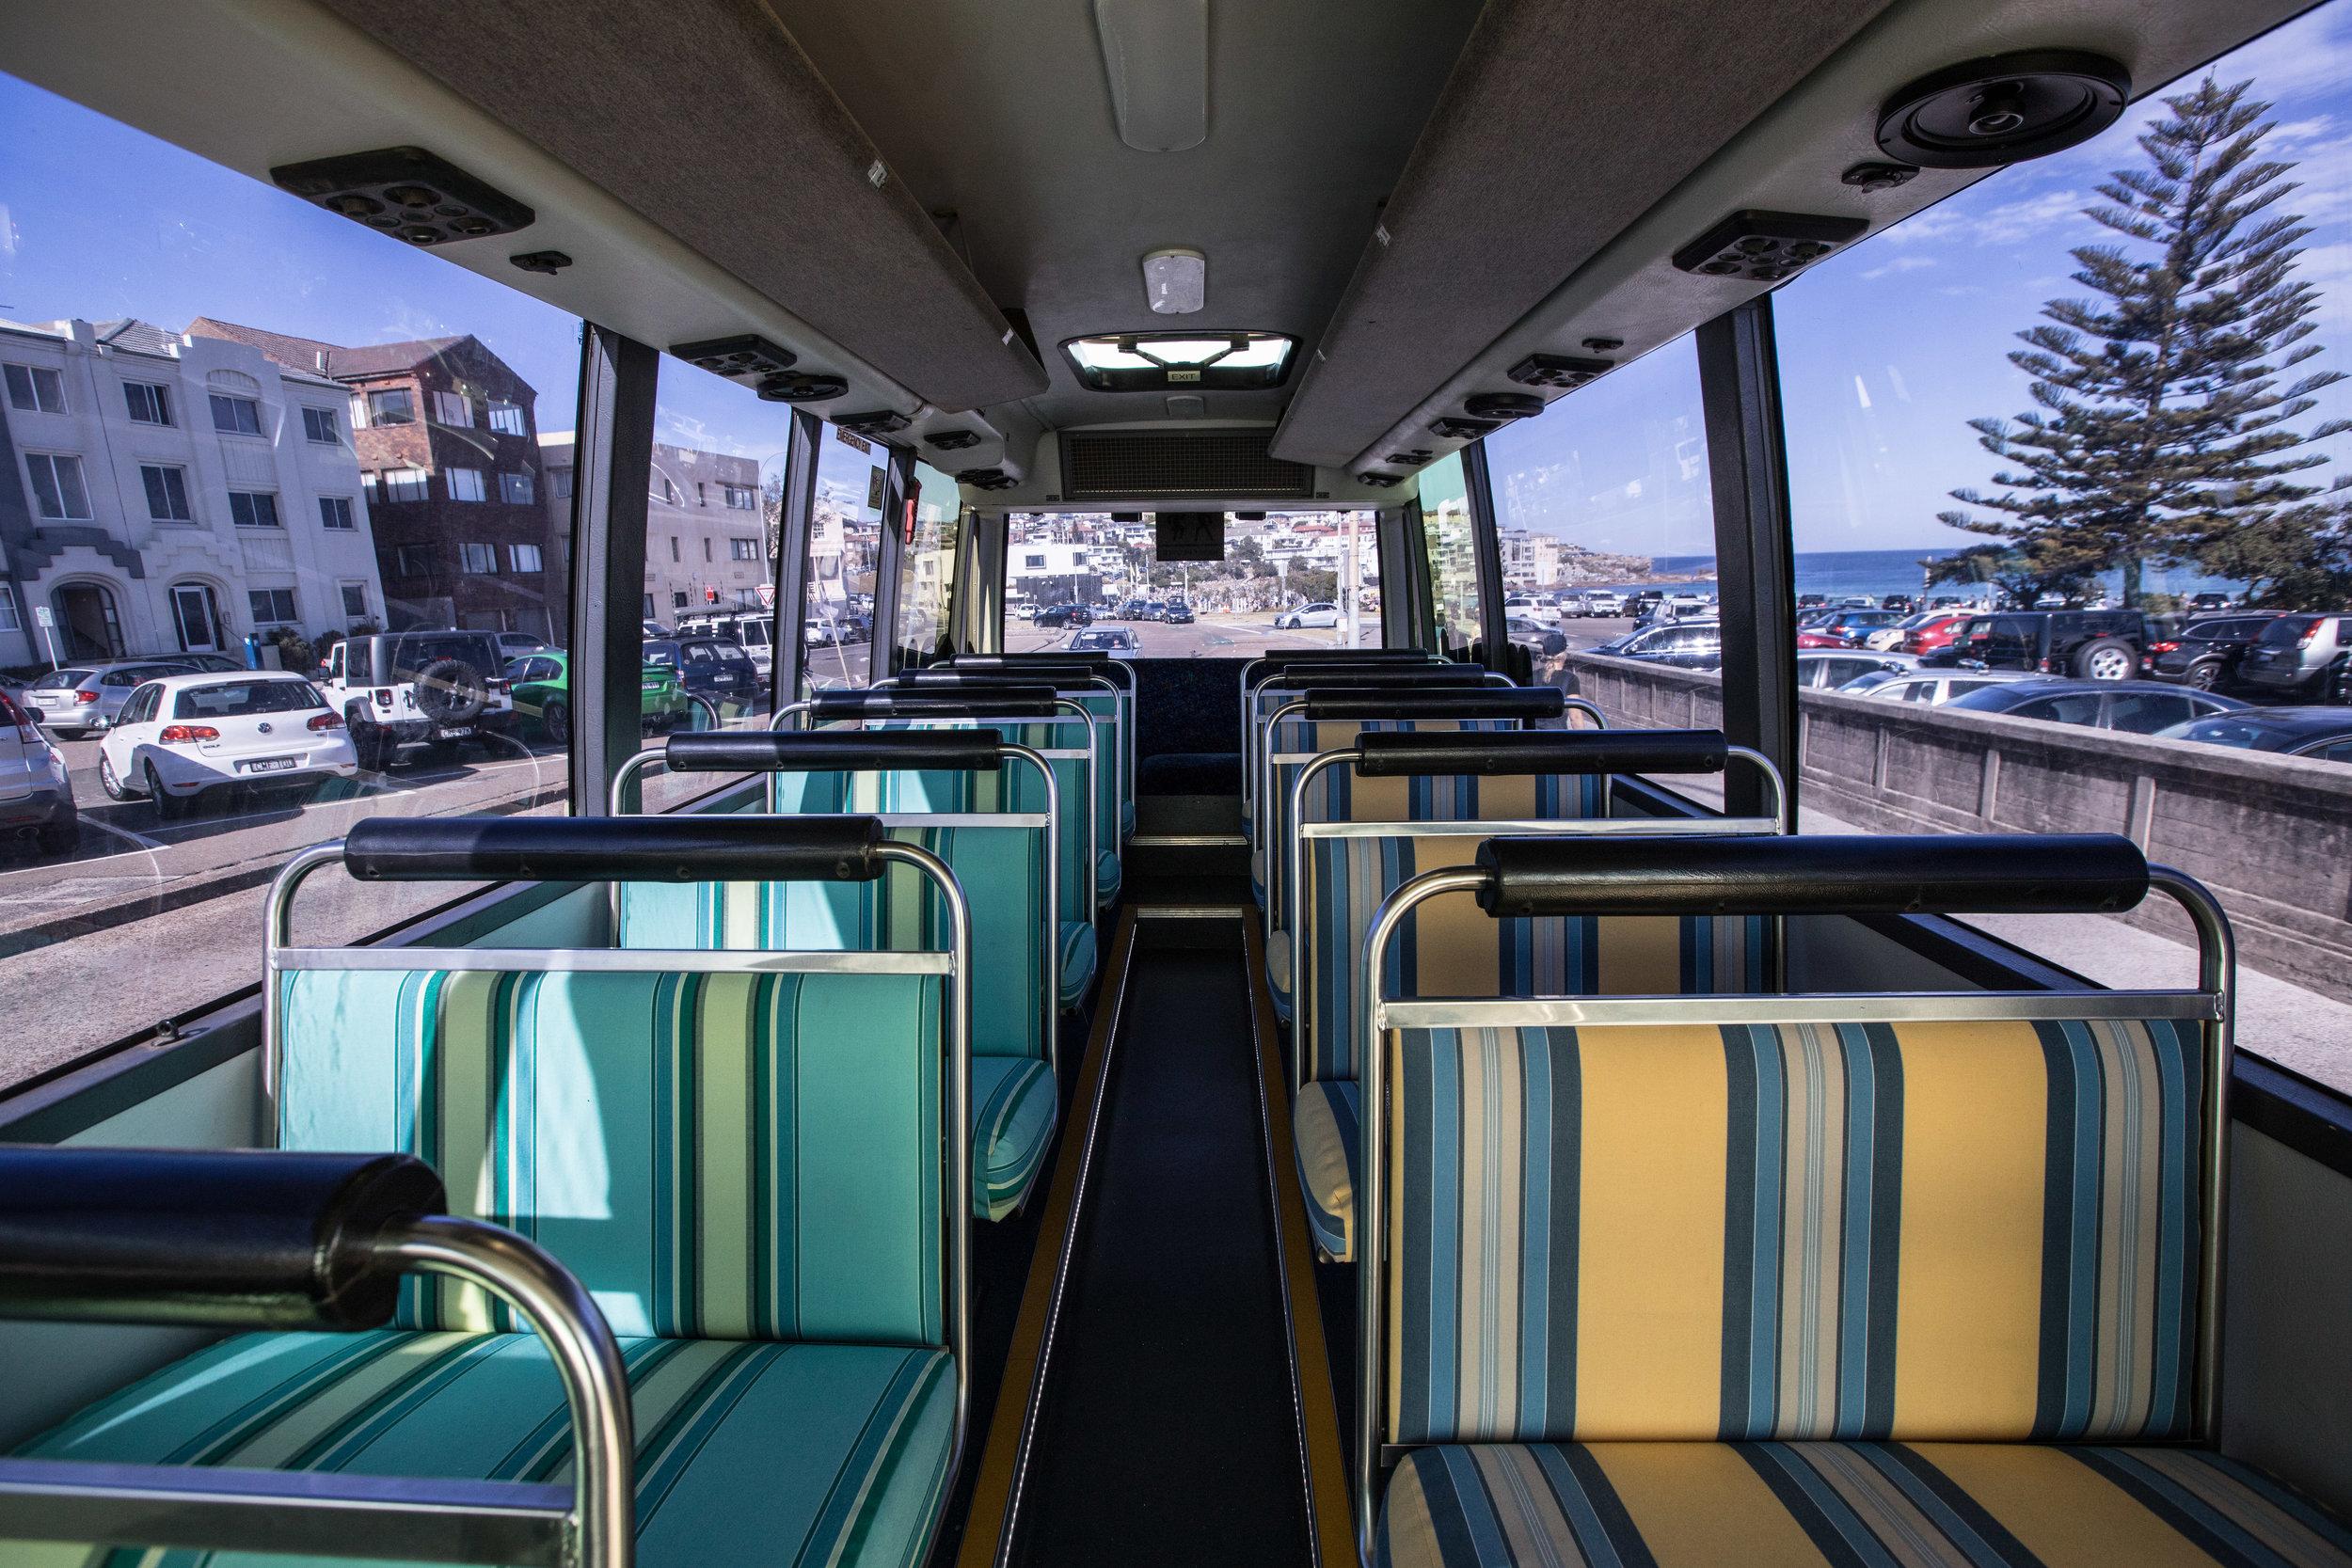 Bucks party bus